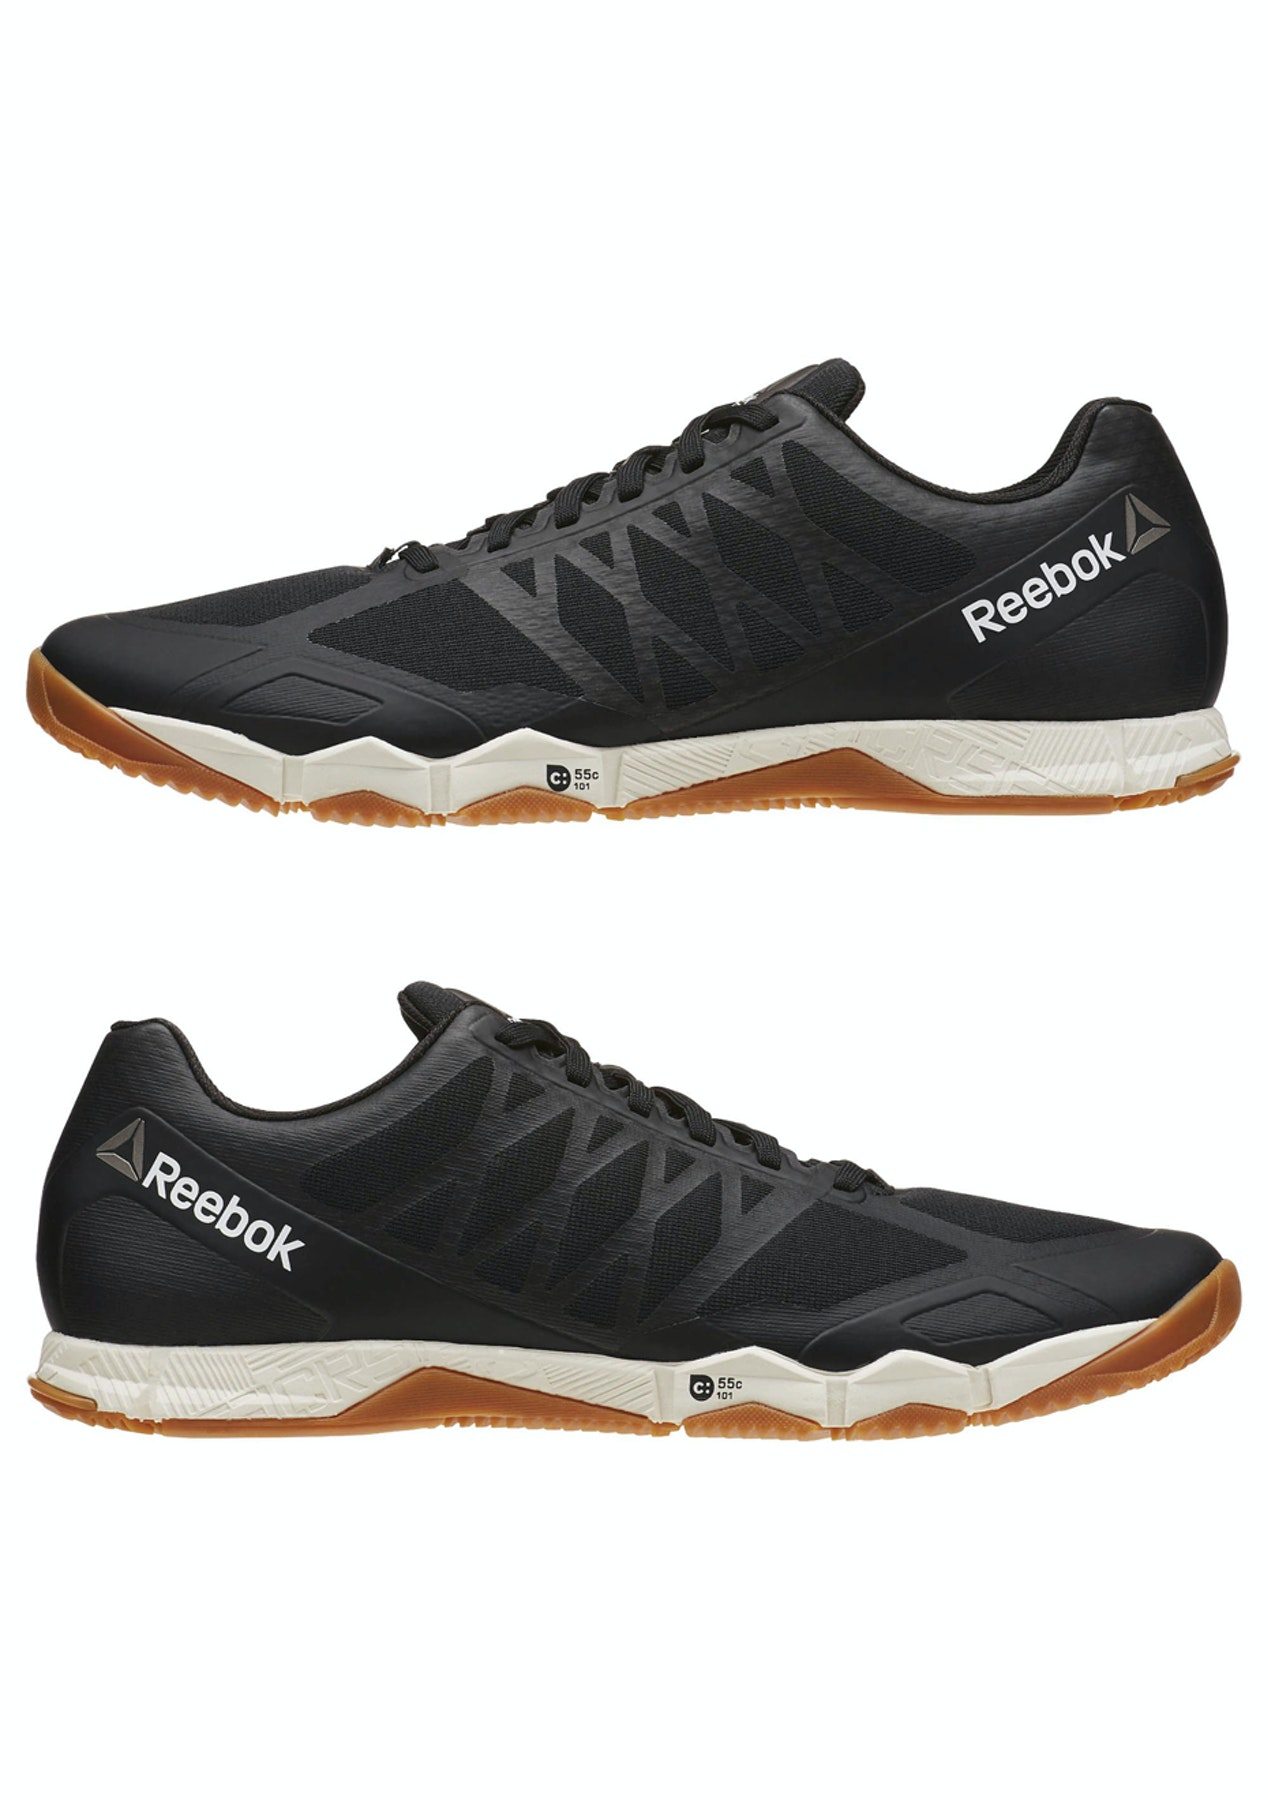 94bee638c9e6a Reebok Mens - R Crossfit Speed Tr - Black   Ash Grey   Classic White    Rubber Gum   Pewter - Mens Shoe Sale - Onceit